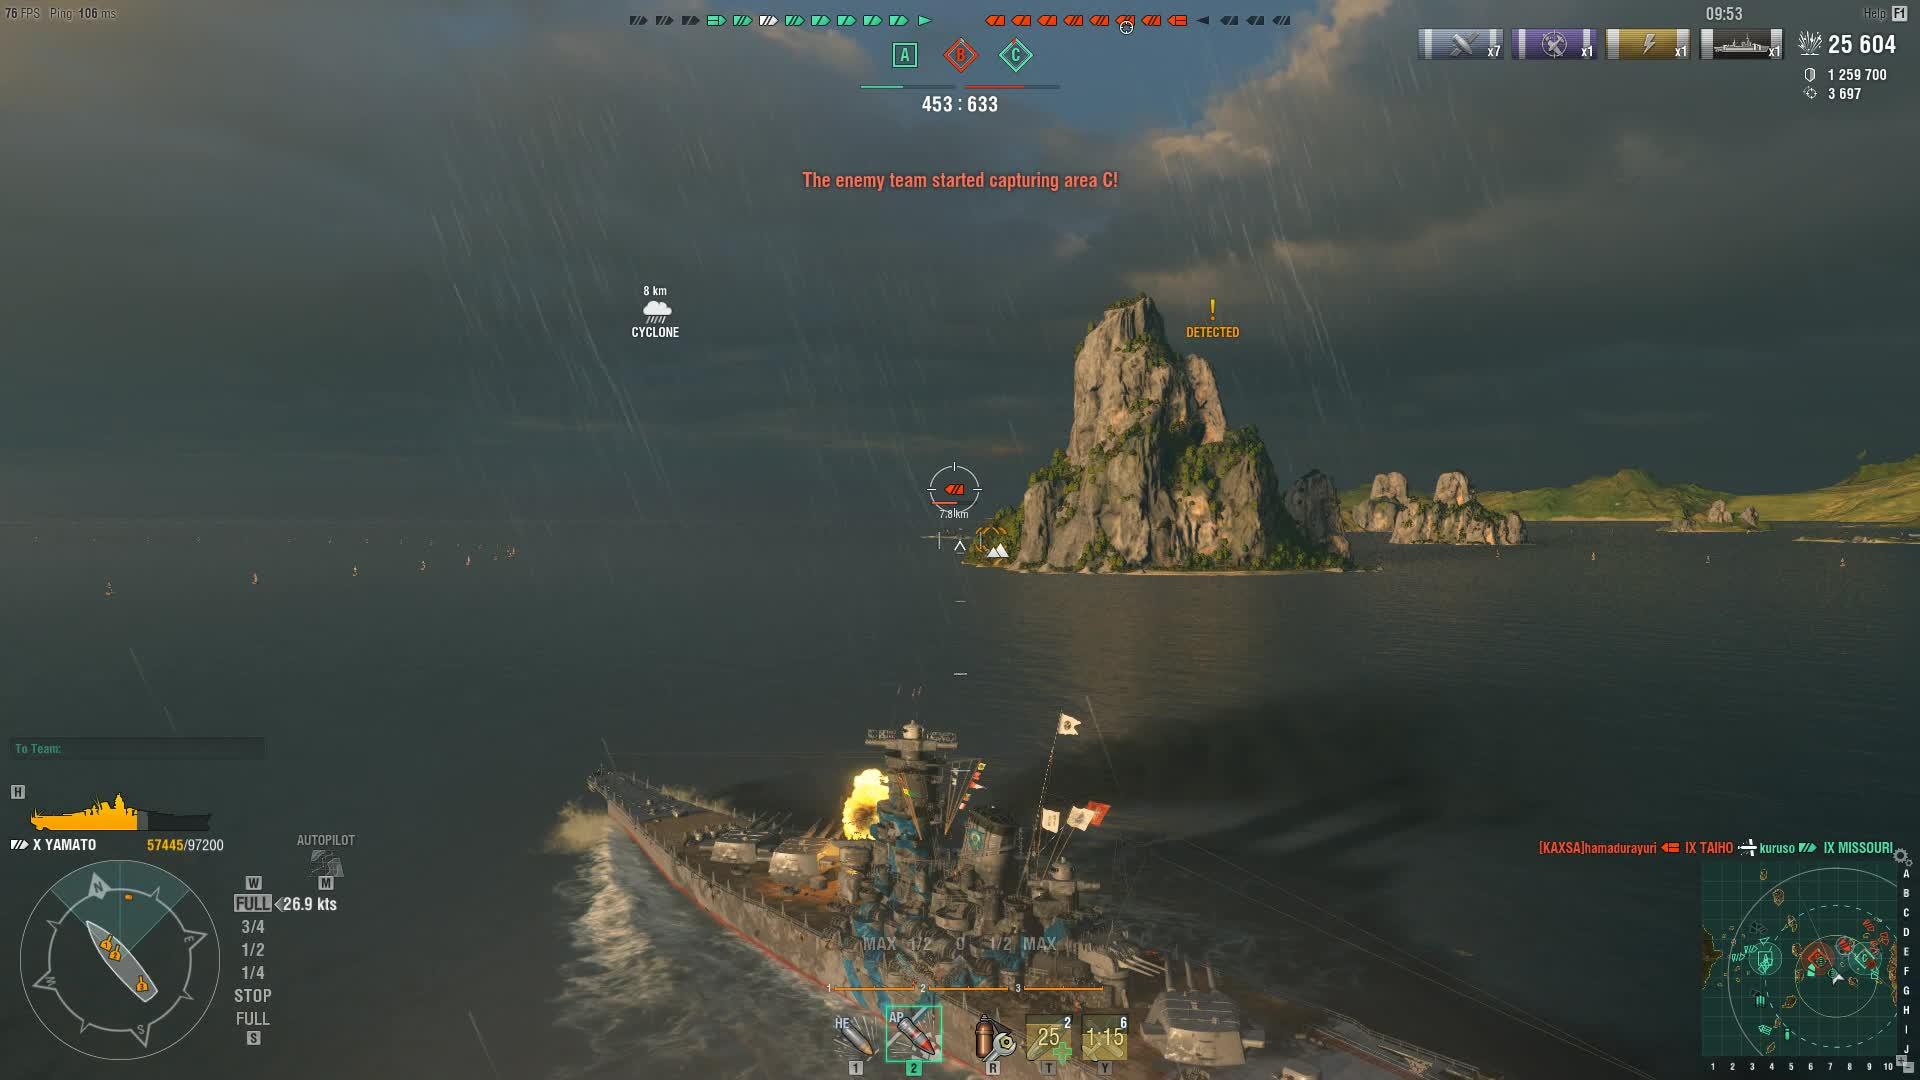 worldofwarships, World of Warships 2018.06.02 - 15.45.00.06.DVR GIFs